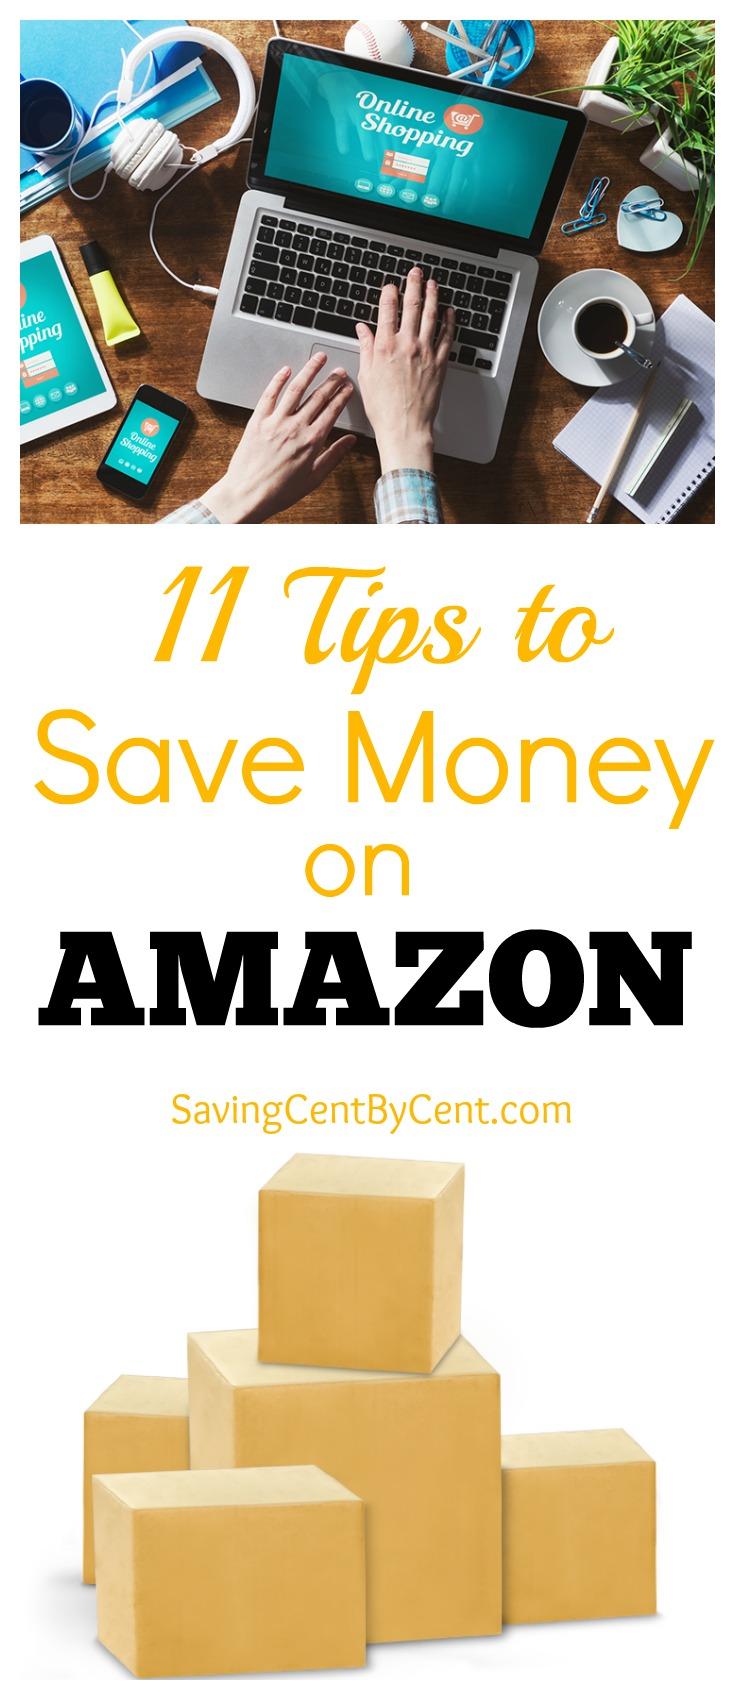 11 tips to save money on amazon